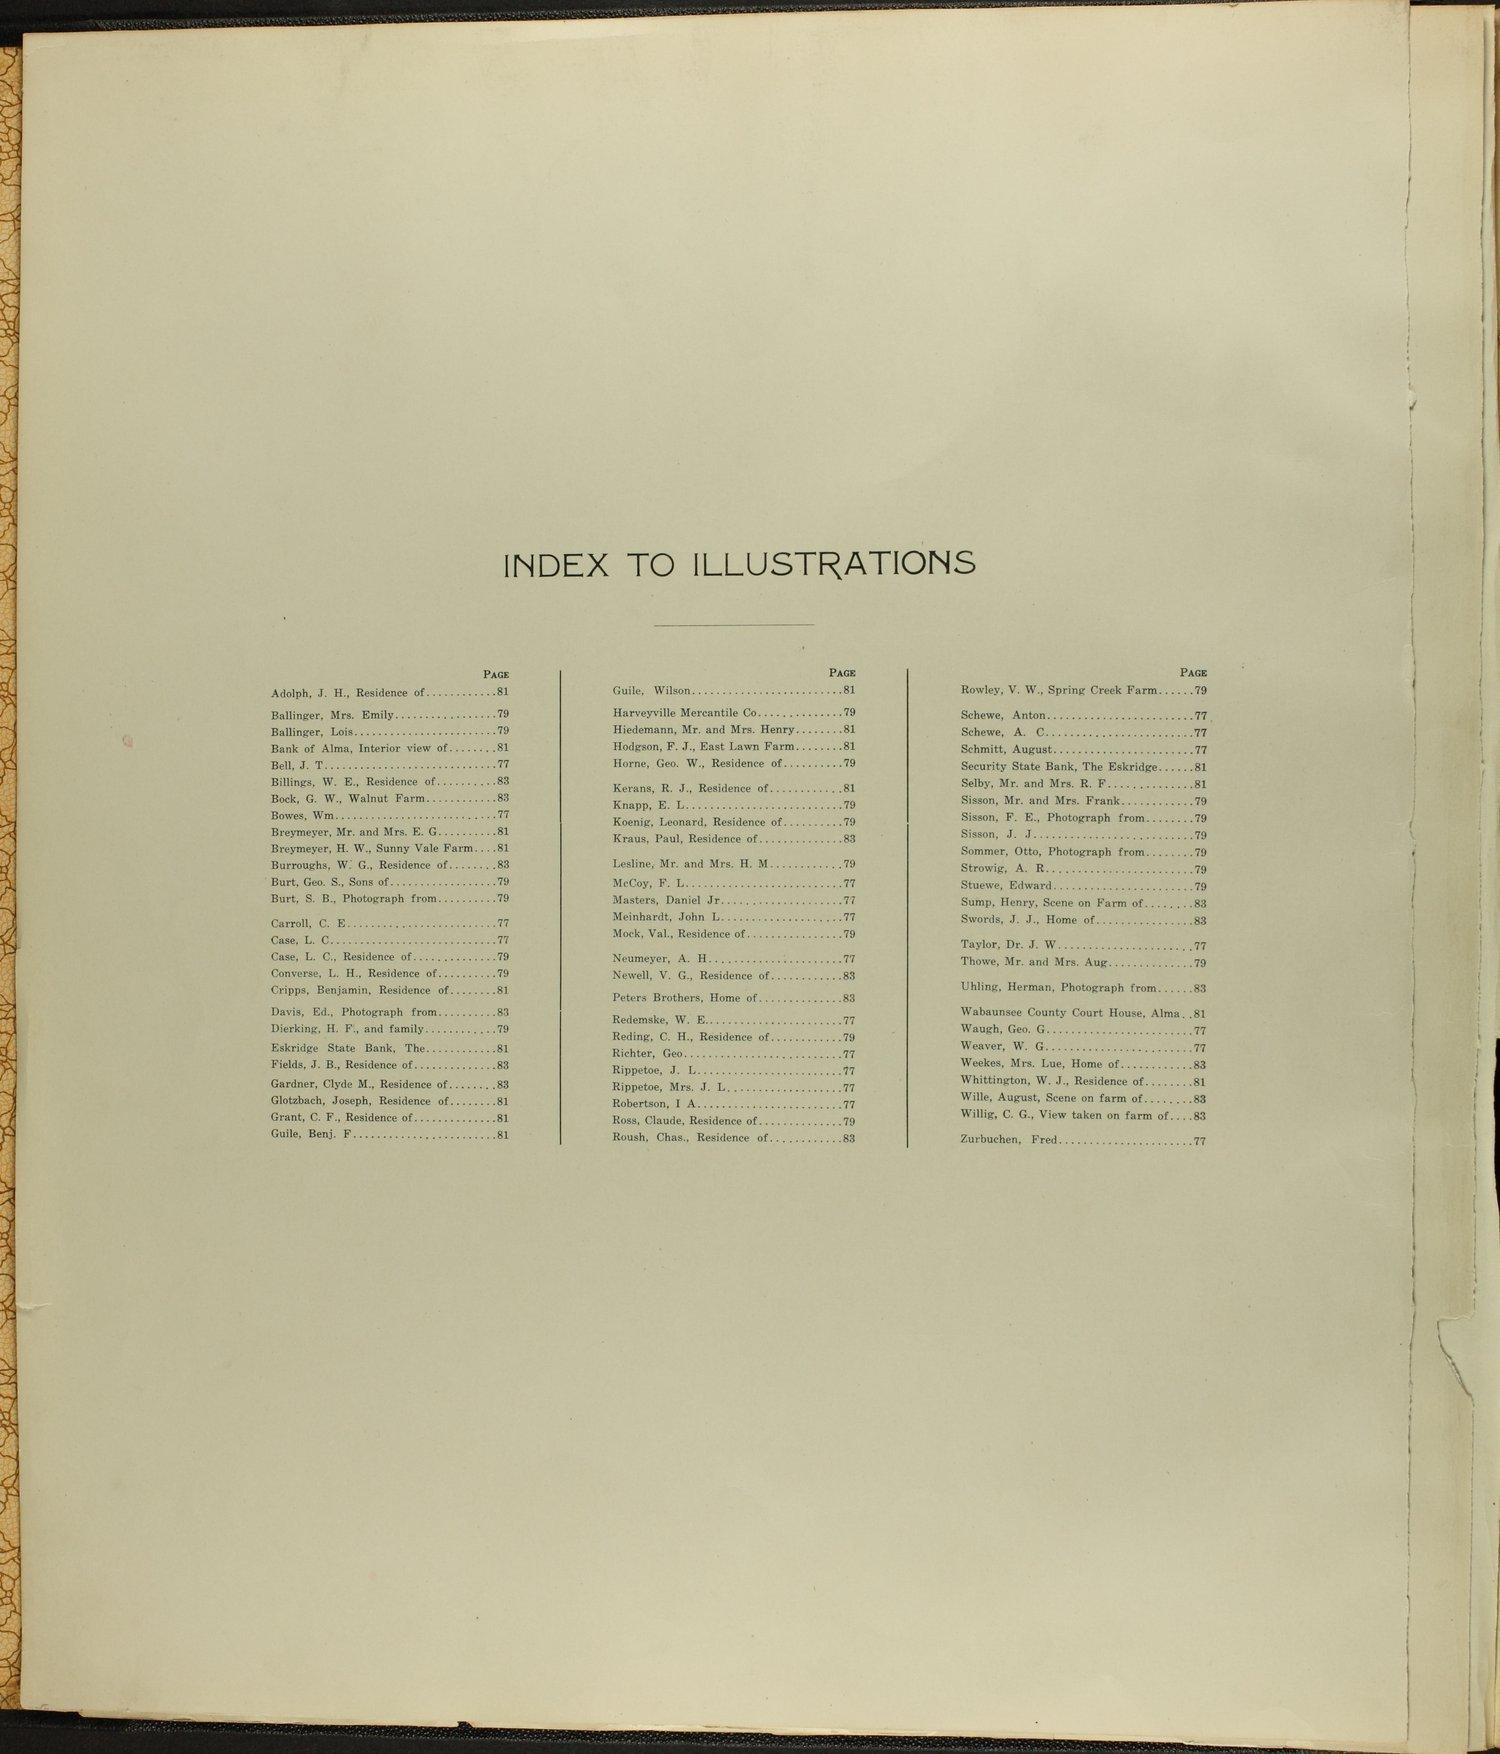 Standard atlas of Wabaunsee County, Kansas - Index to Illustrations